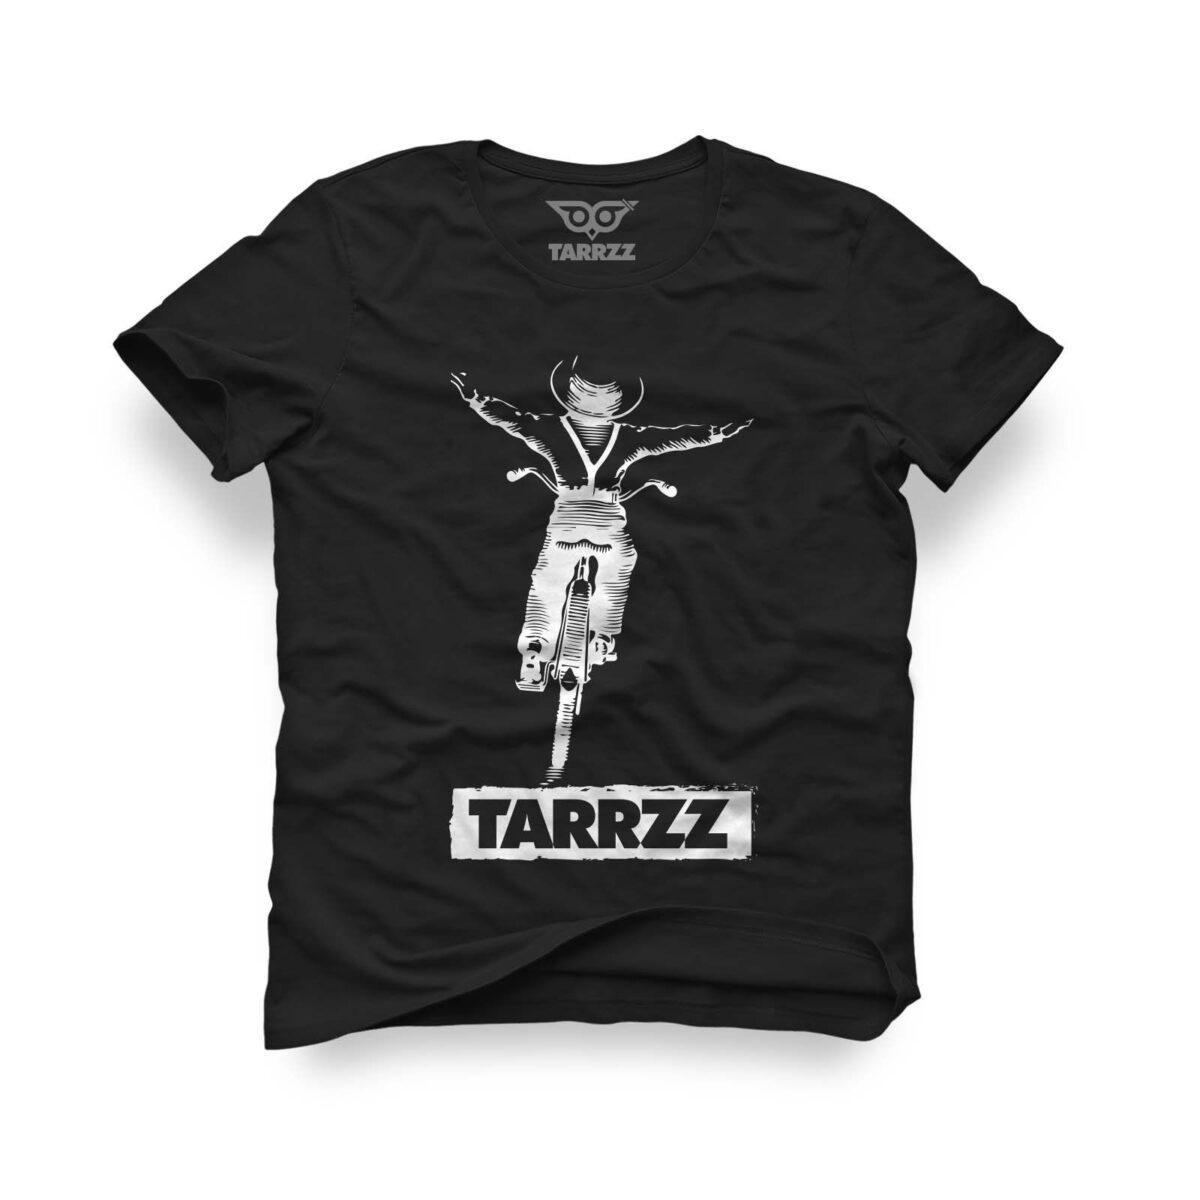 tarrzz-tasarim-siyah-tisort-ozgurce-yasa